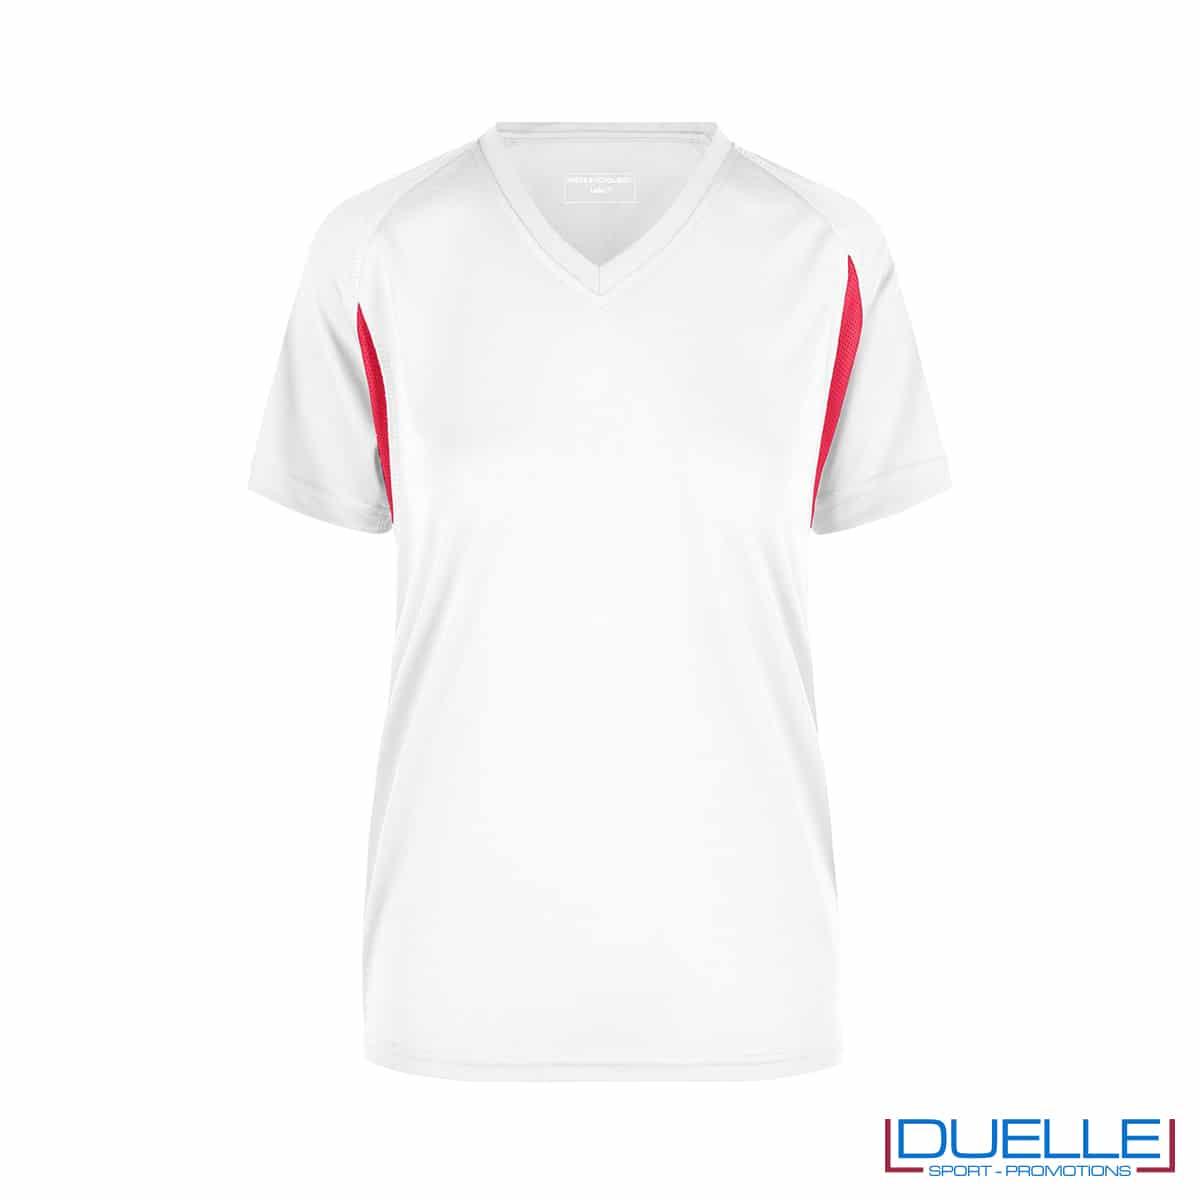 T-shirt running donna personalizzata colore bianco-rosso